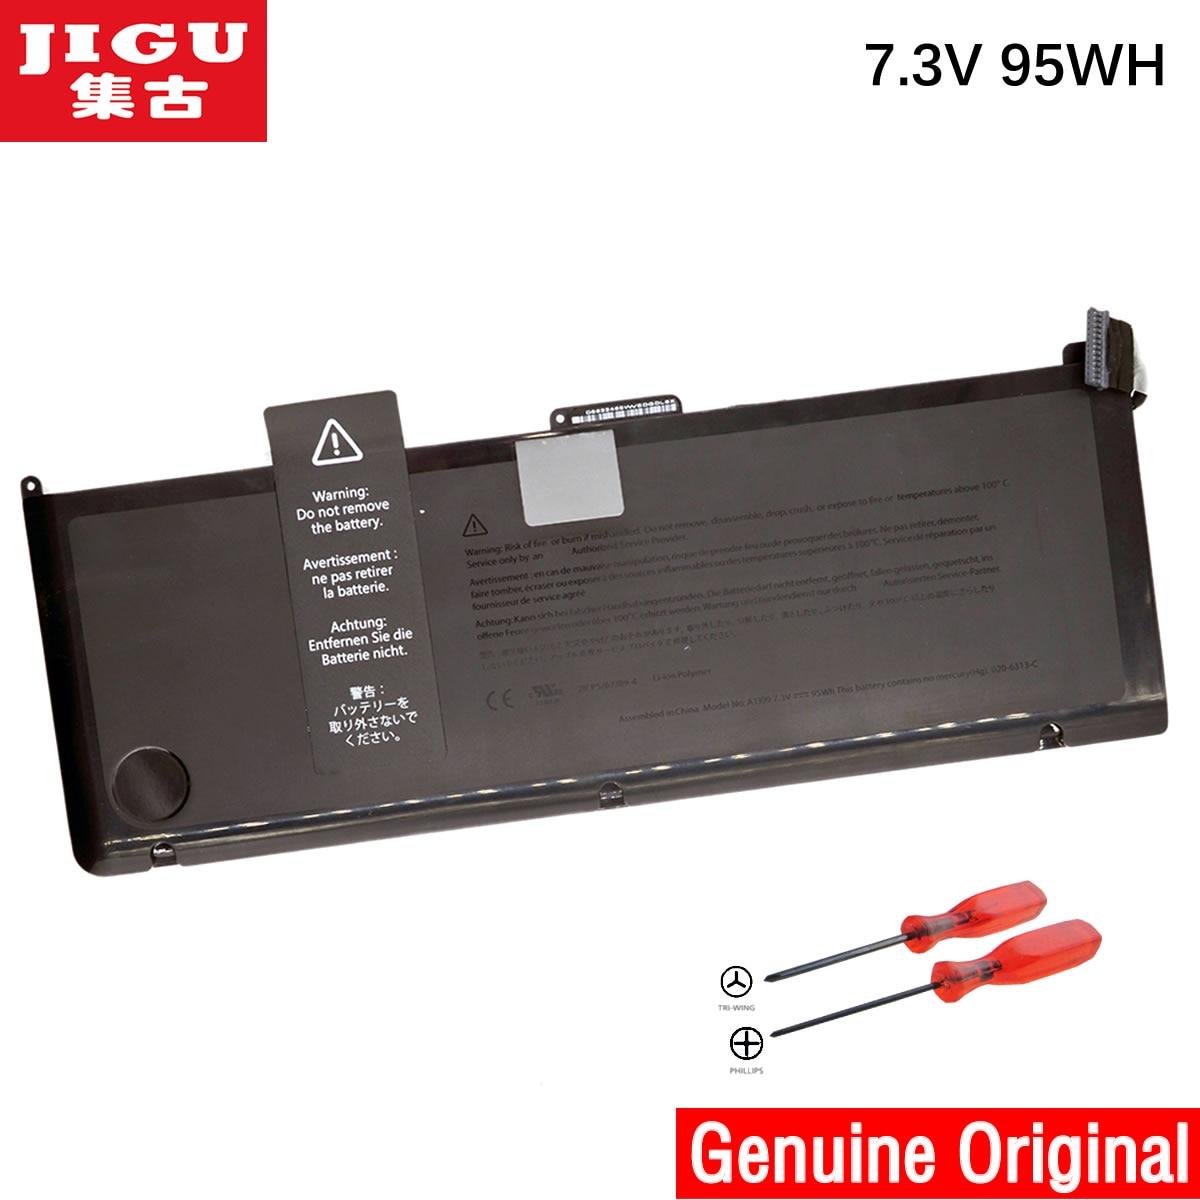 JIGU A1309 Original Laptop Battery For APPLE MacBook Pro 17 A1297  [2009 Production] MC226*/A MC226CH/A 95WH 43w4342 44e8763 battery for mr10i mr10is original 95